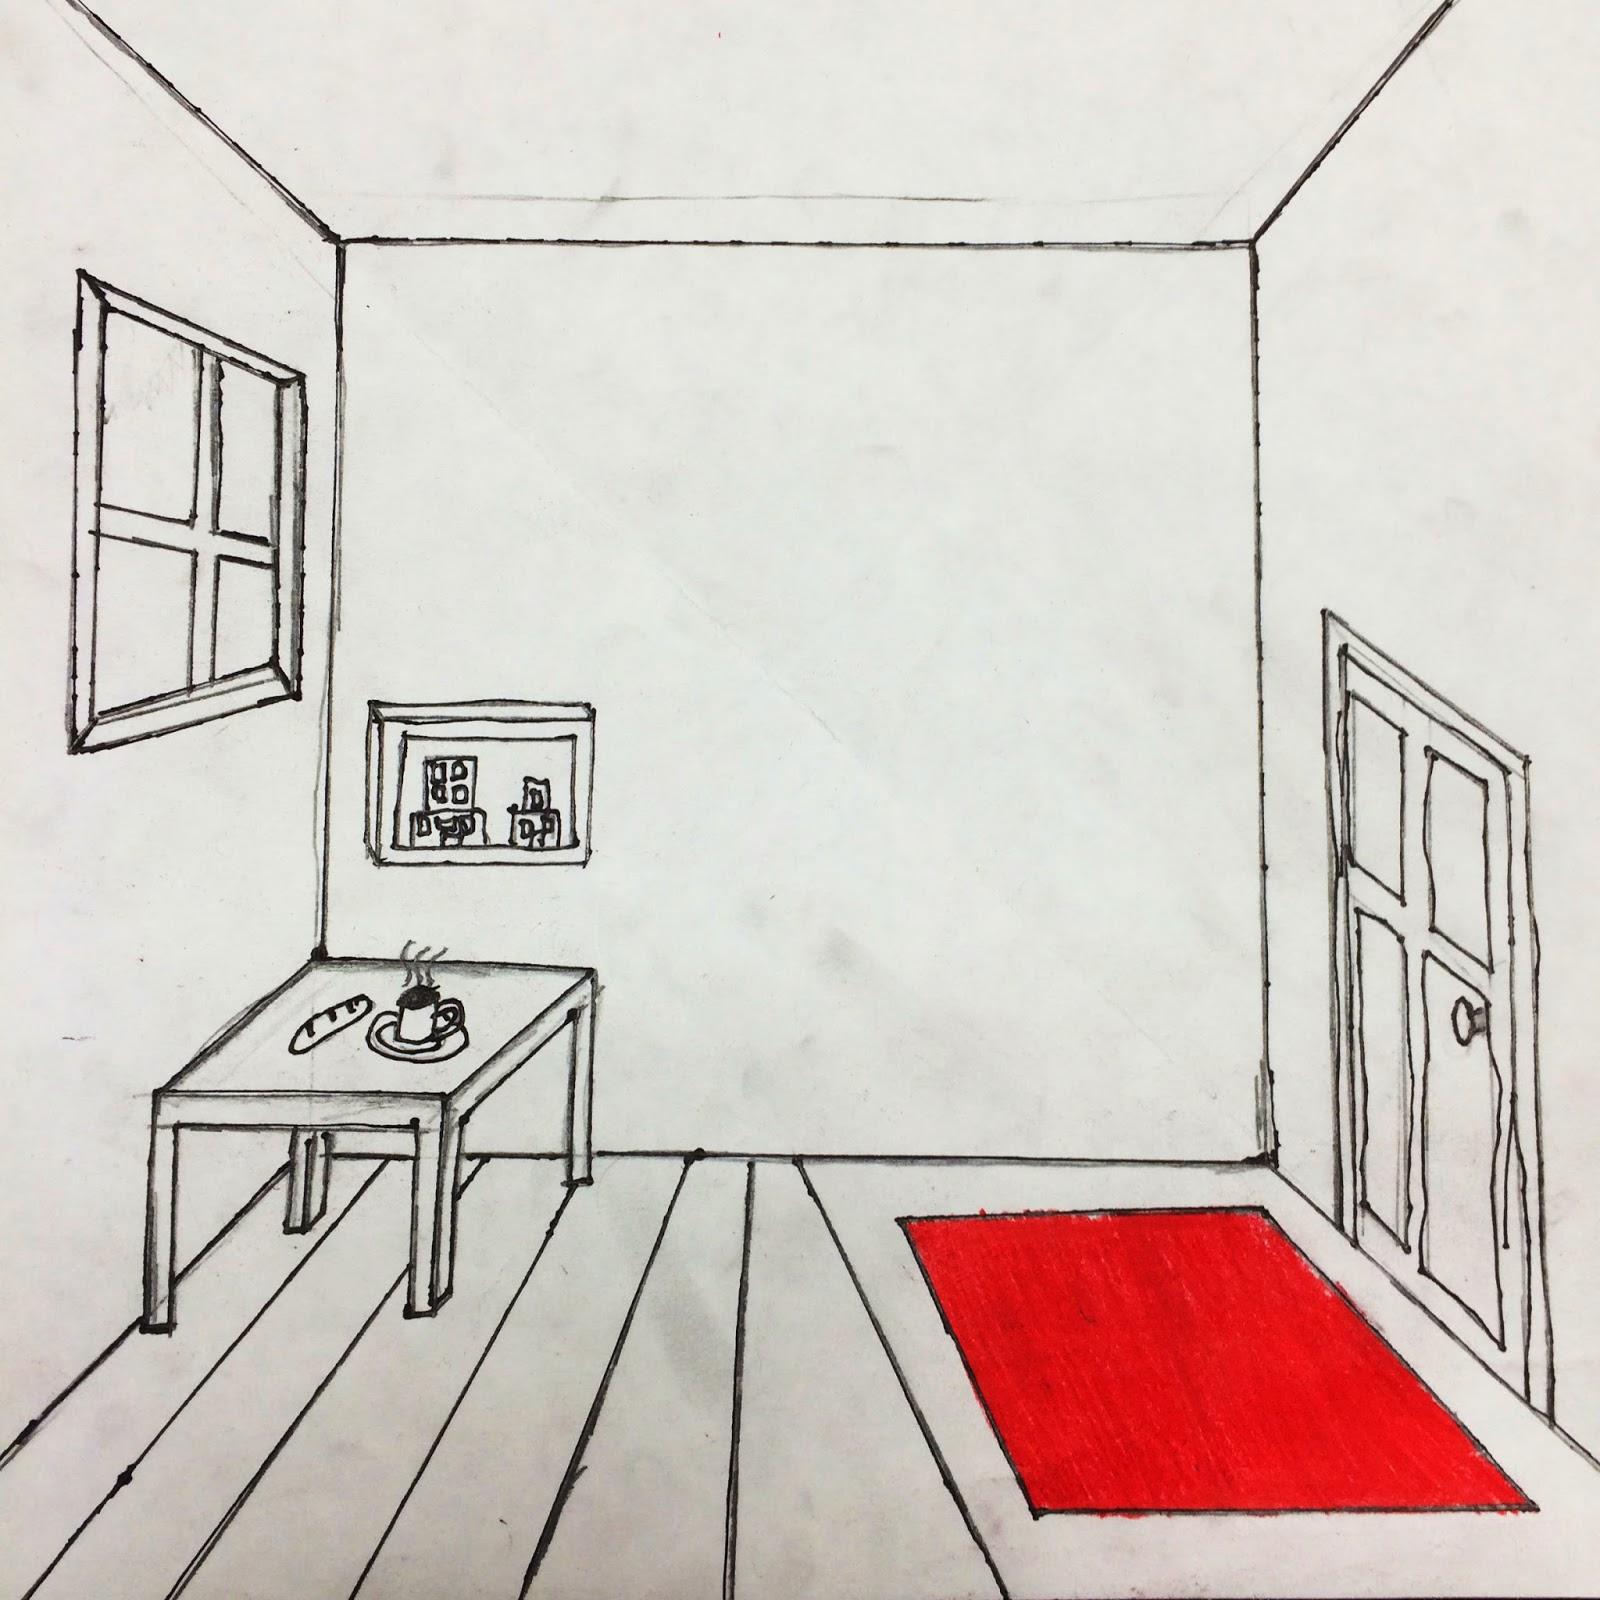 3d Bedroom Drawing At Getdrawings